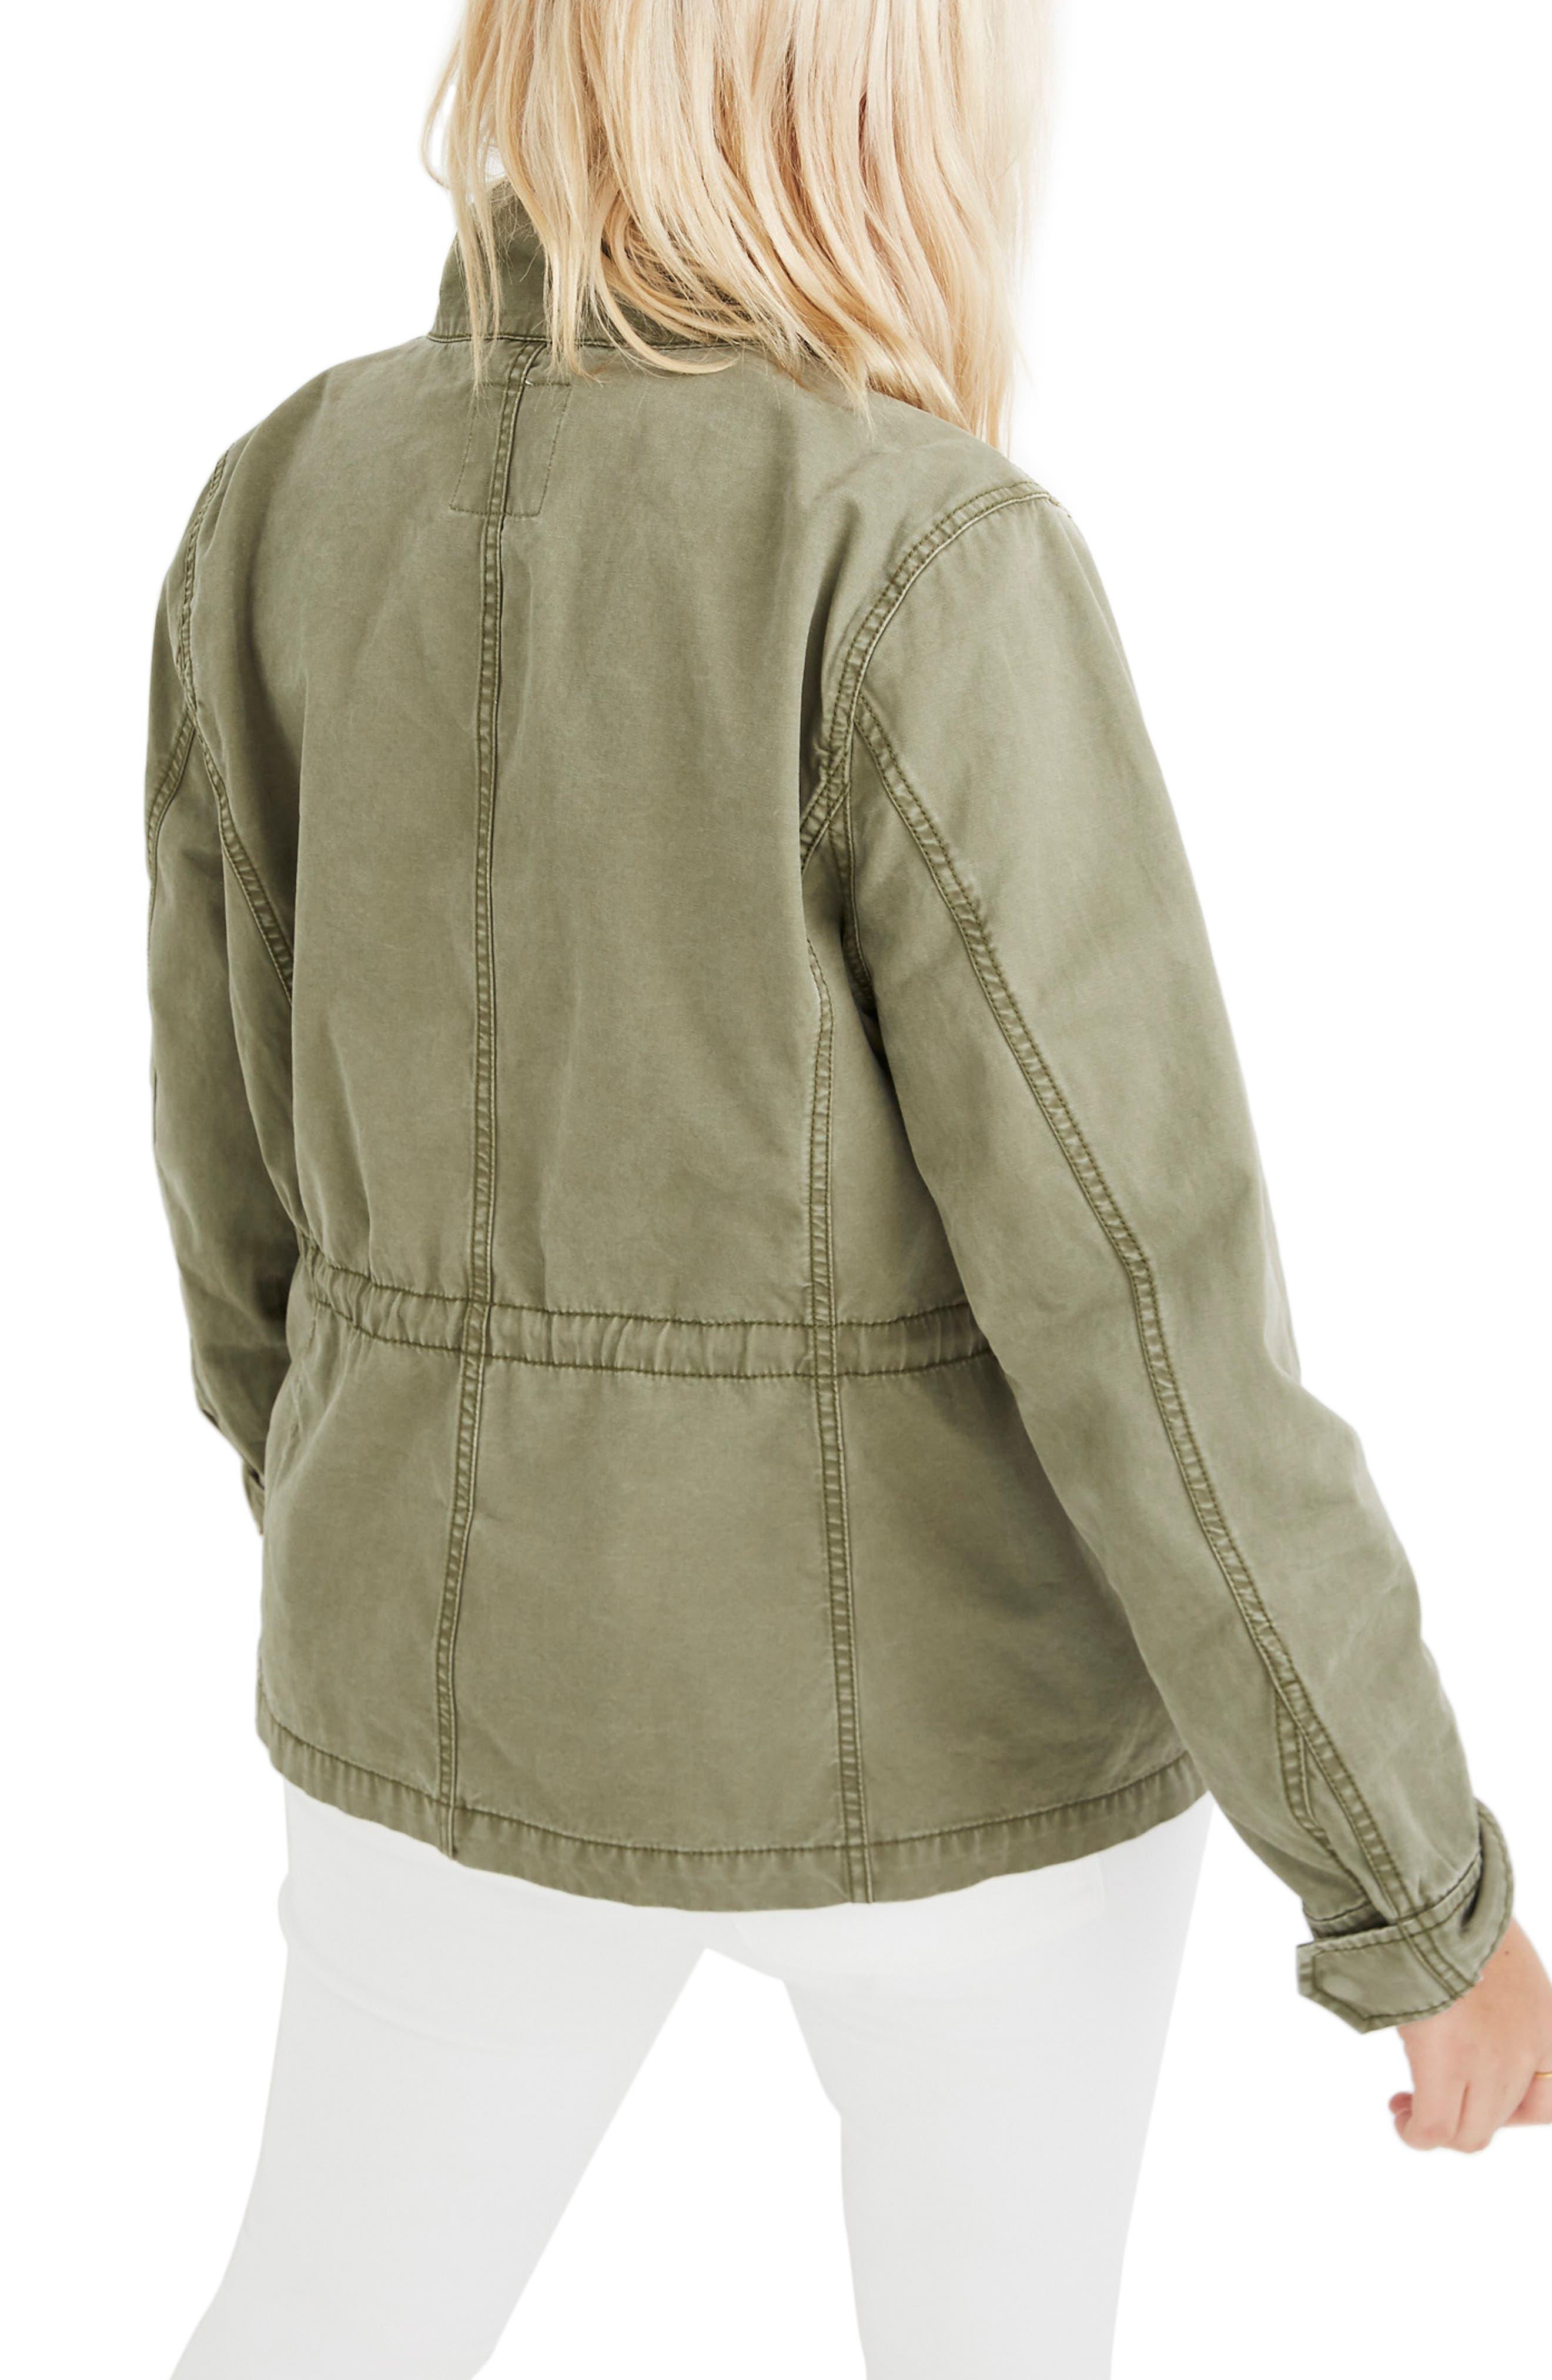 MADEWELL,                             Surplus Cotton Jacket,                             Alternate thumbnail 7, color,                             DESERT OLIVE